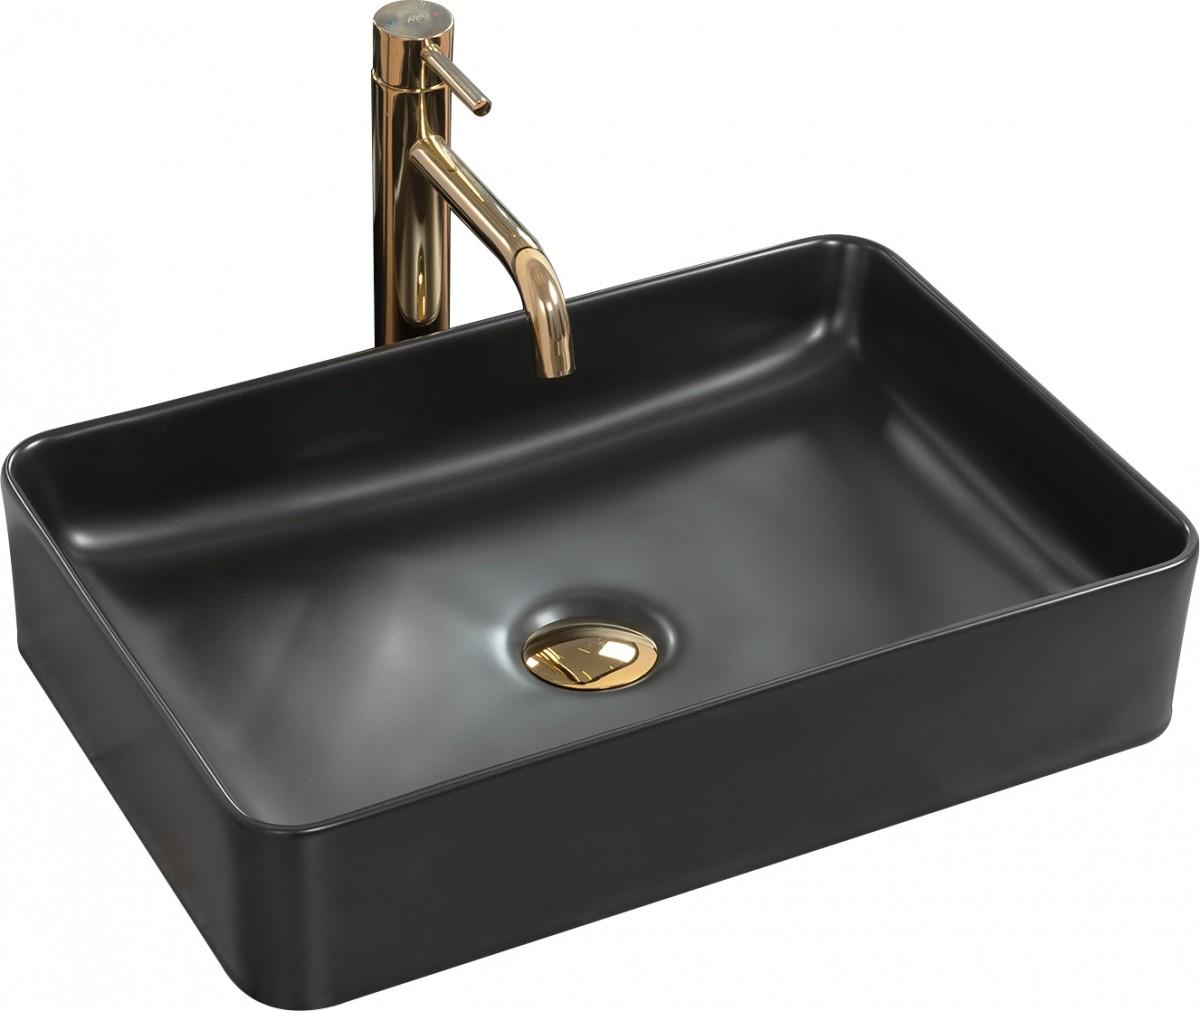 Keramické umývadlo na dosku Rea Avia 50,5 × 34,5 cm čierne